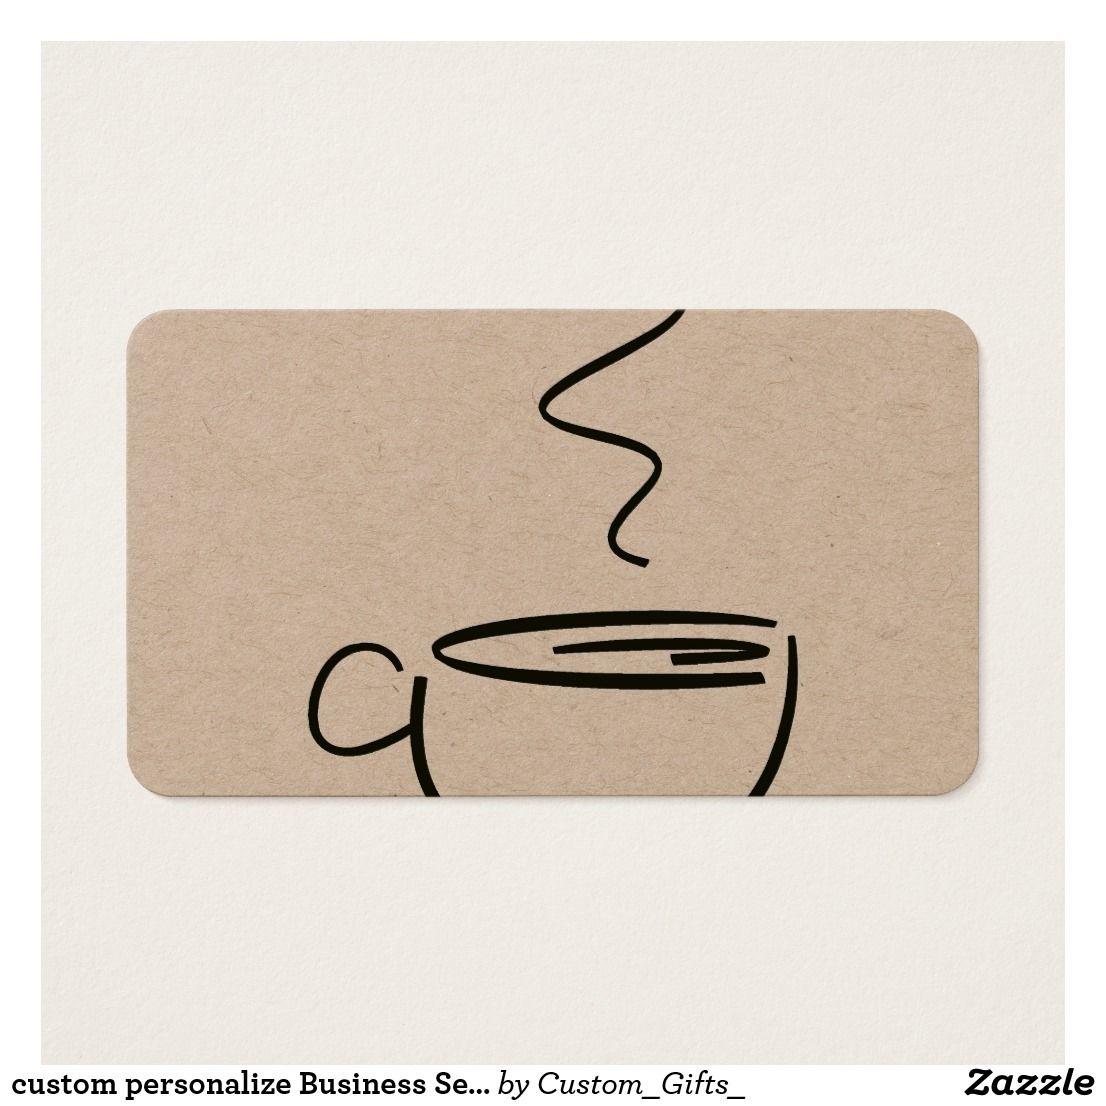 custom personalize Business Service Desk office Business Card ...